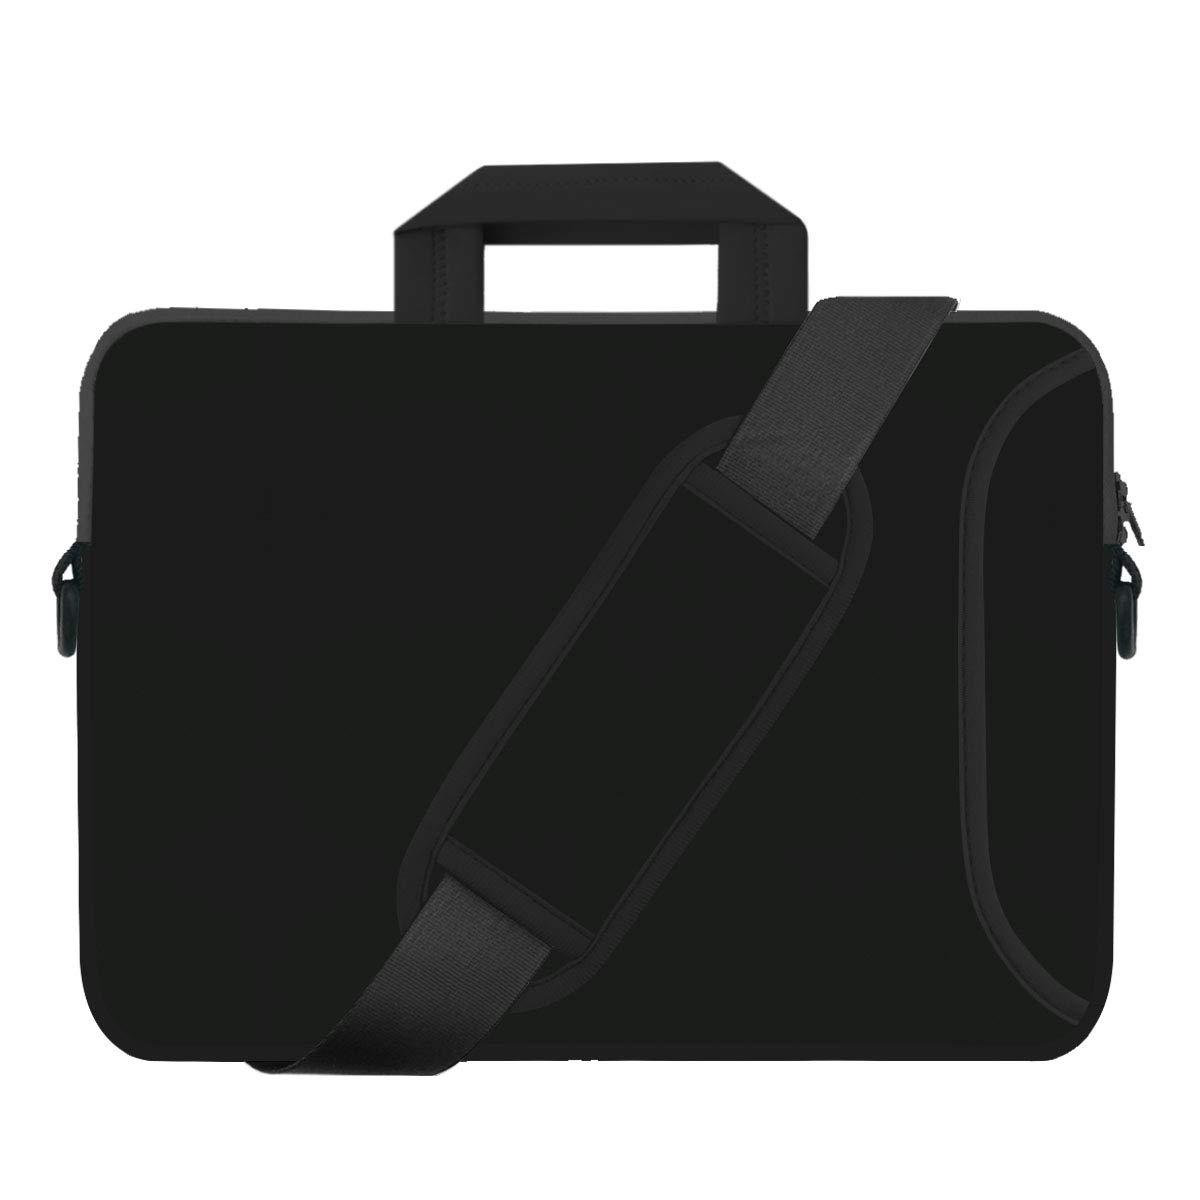 Laptop Bag Computer Bag Hard Shell 17 inch Black Thick